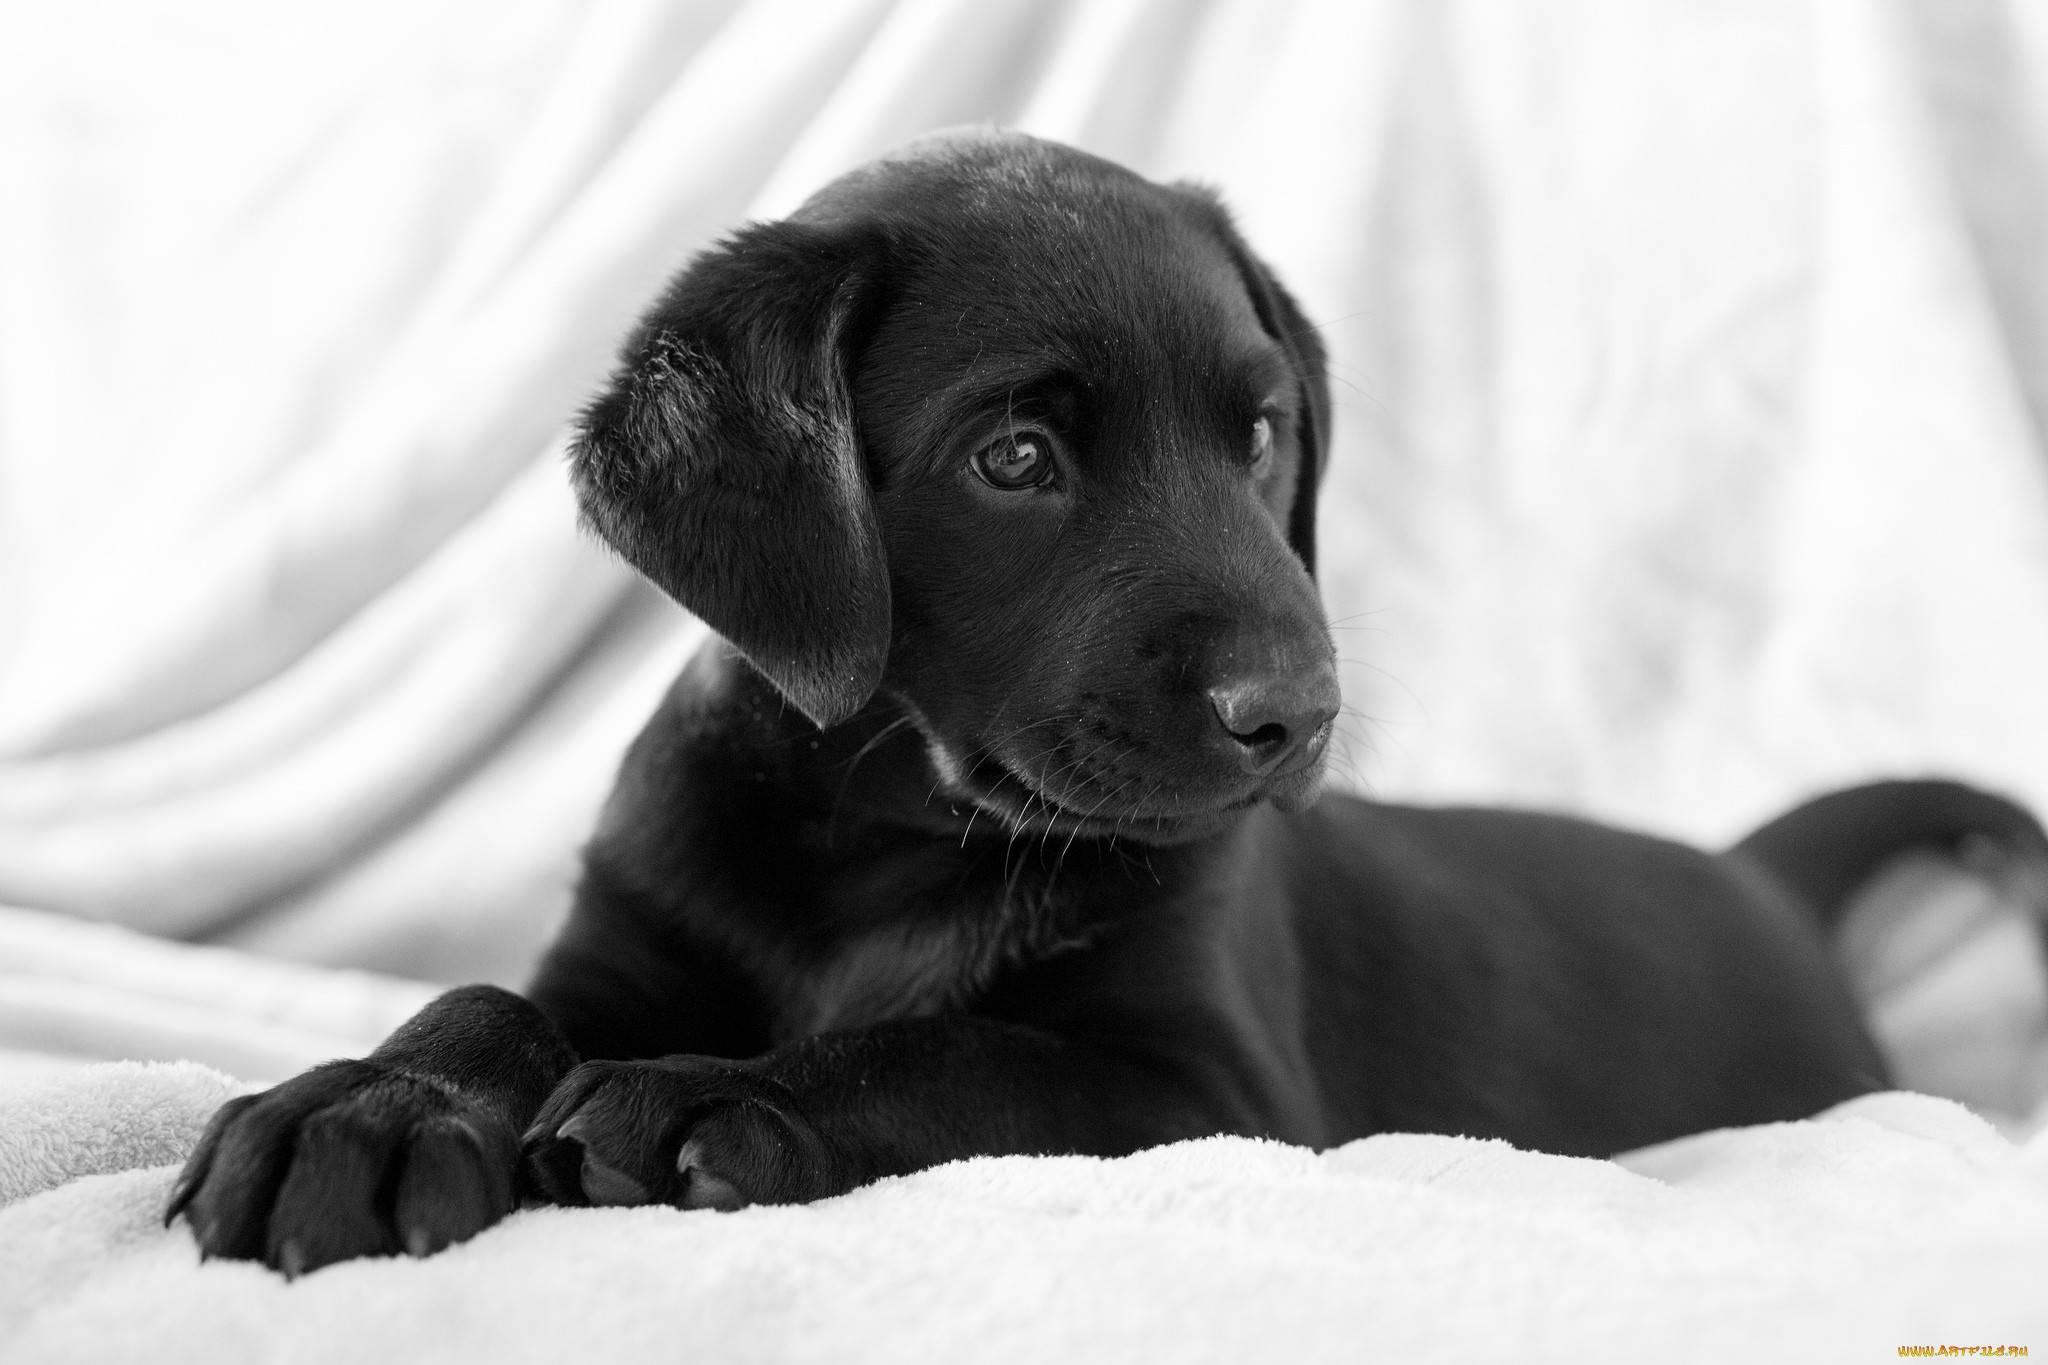 460798-dogs-black-dog | PetLife West Palm Beach